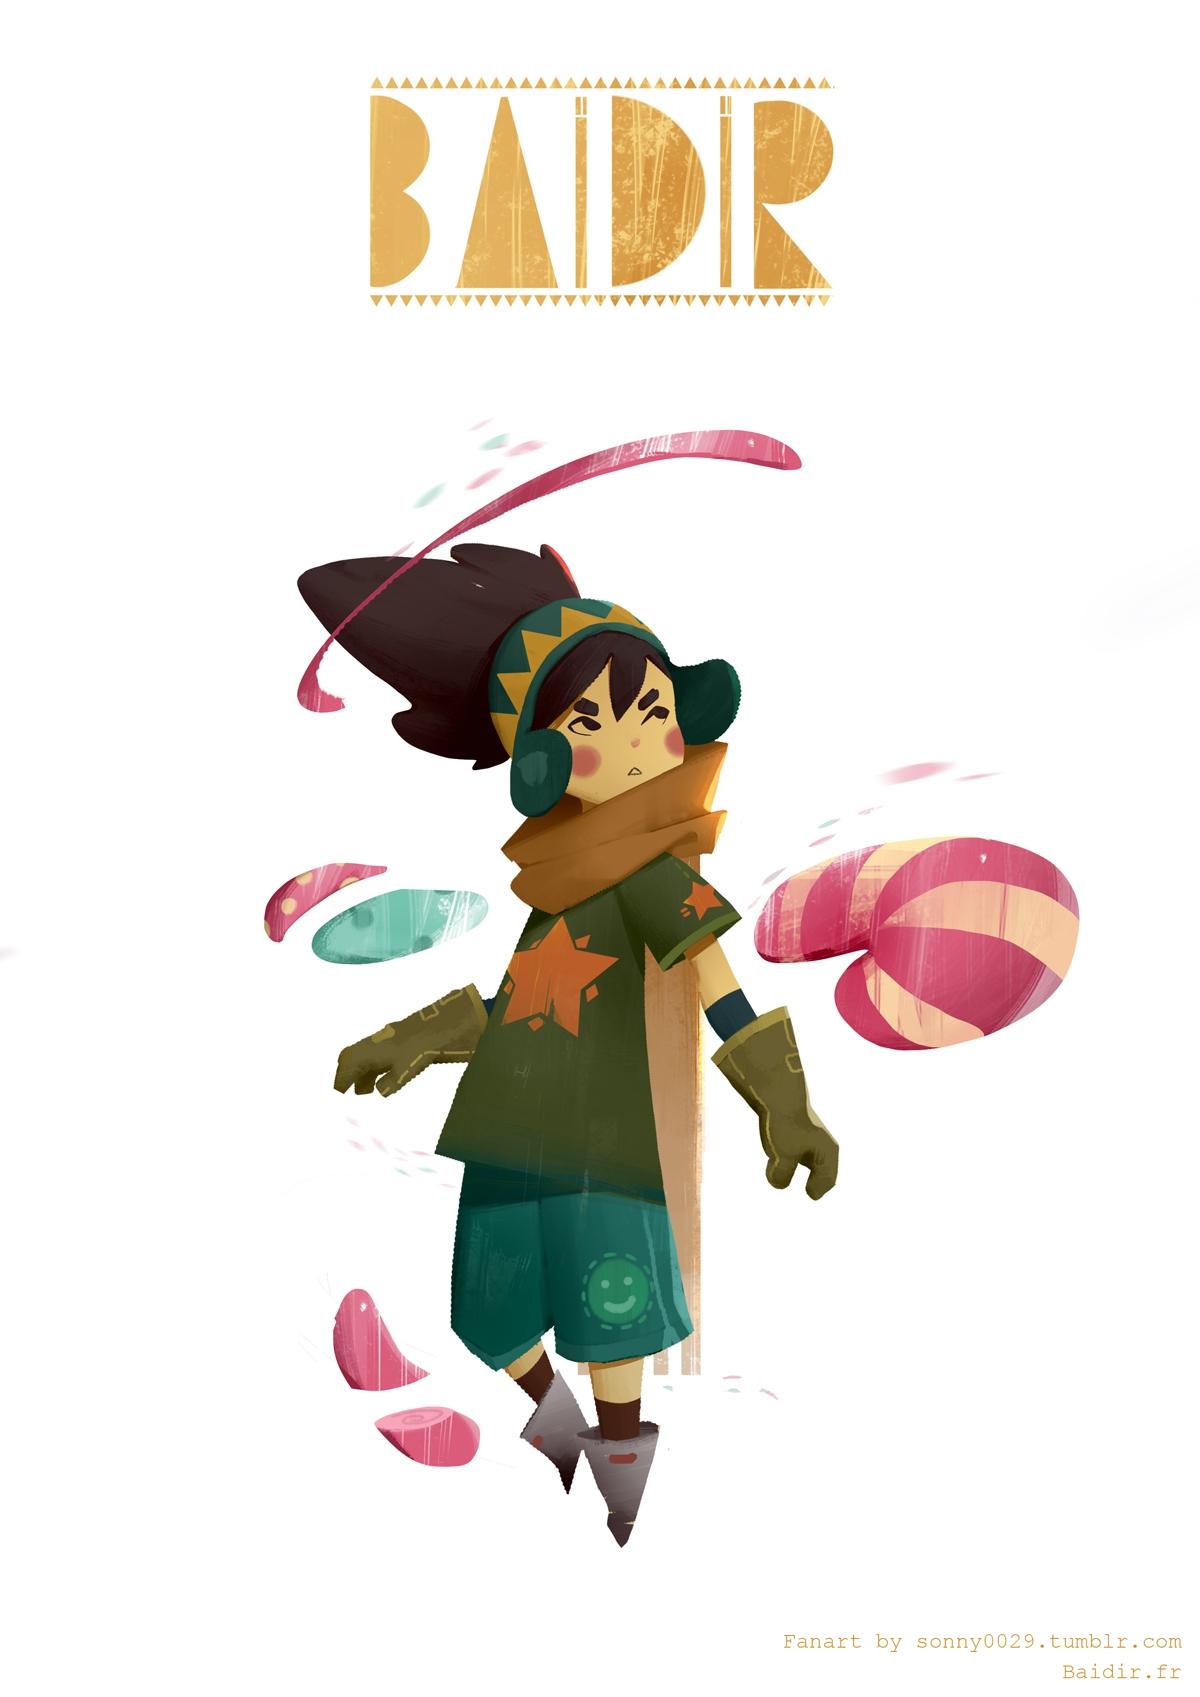 Baidir Fanart - characterdesign - sonny-2874 | ello